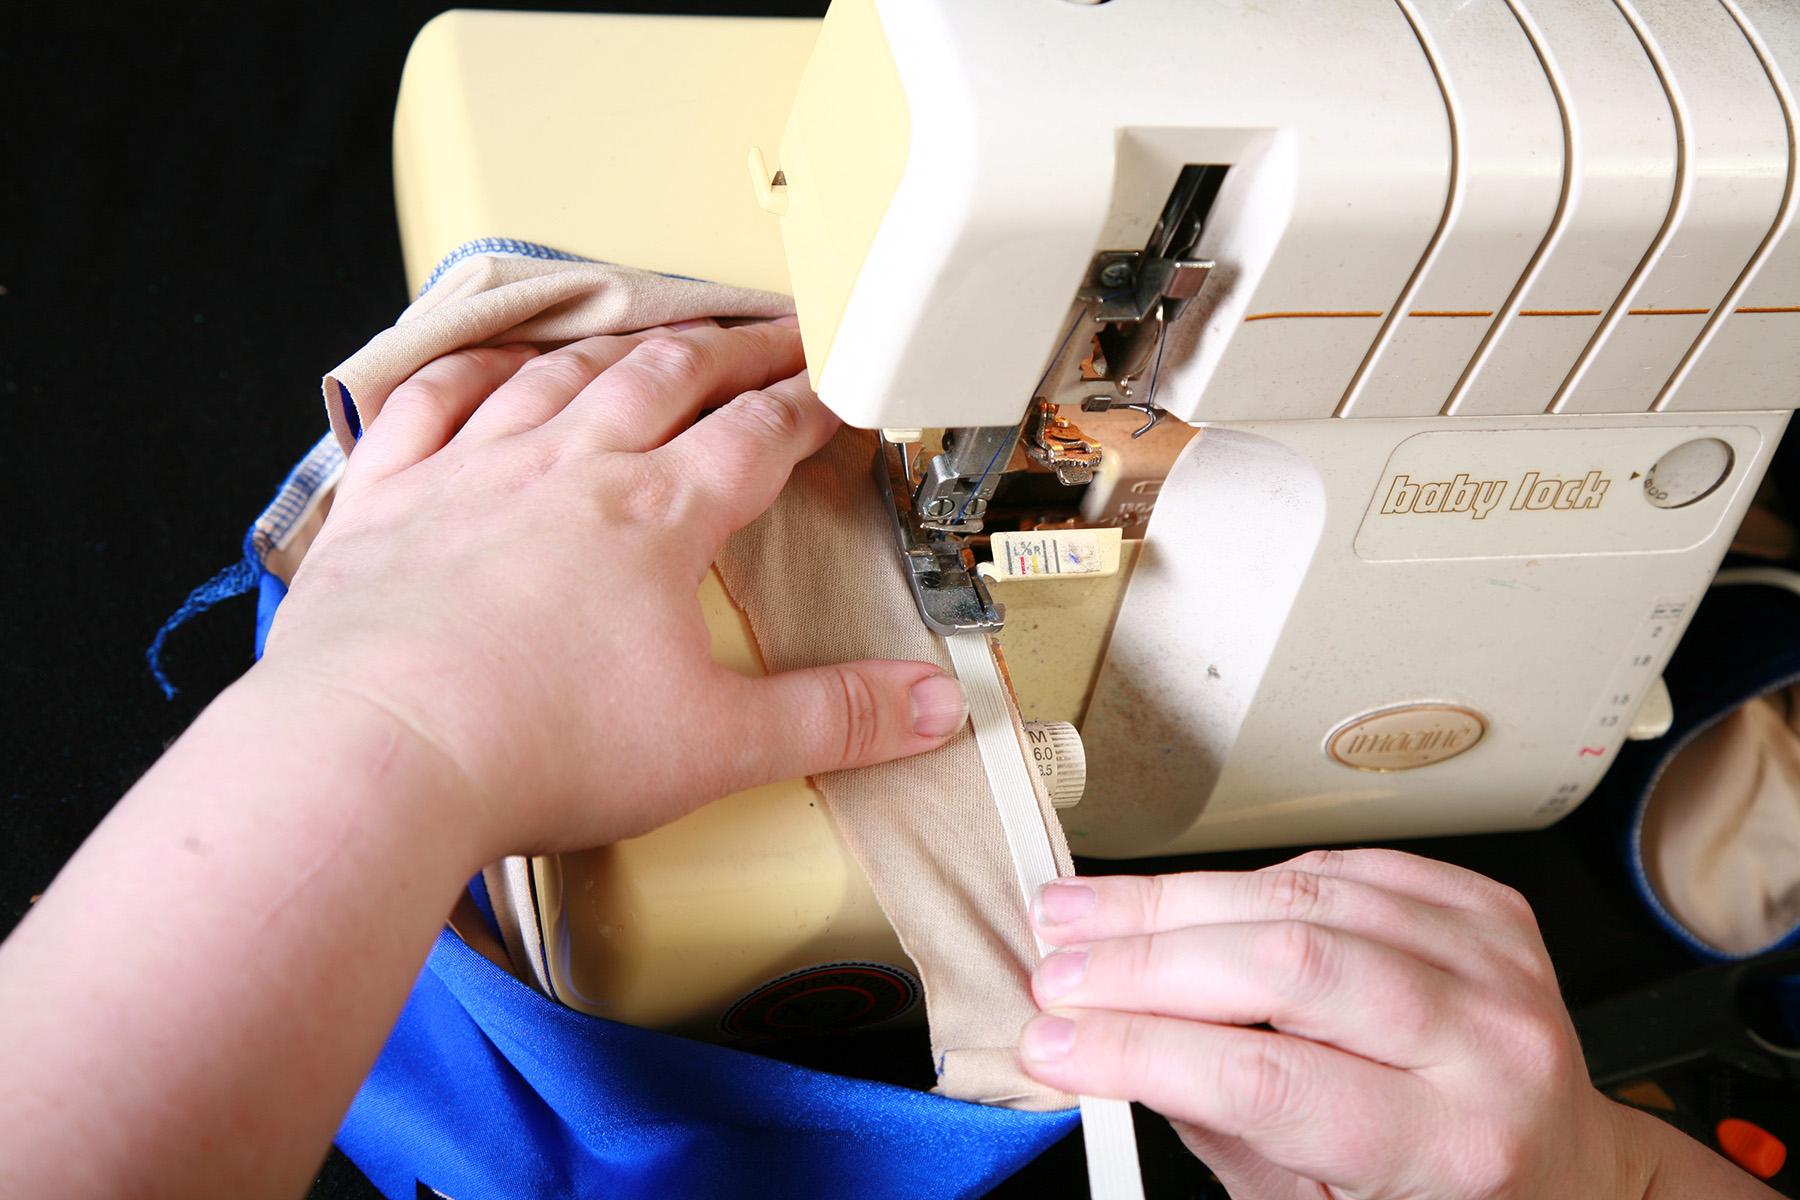 Hands guide a blue, lined bikini bottom through a sewing machine.